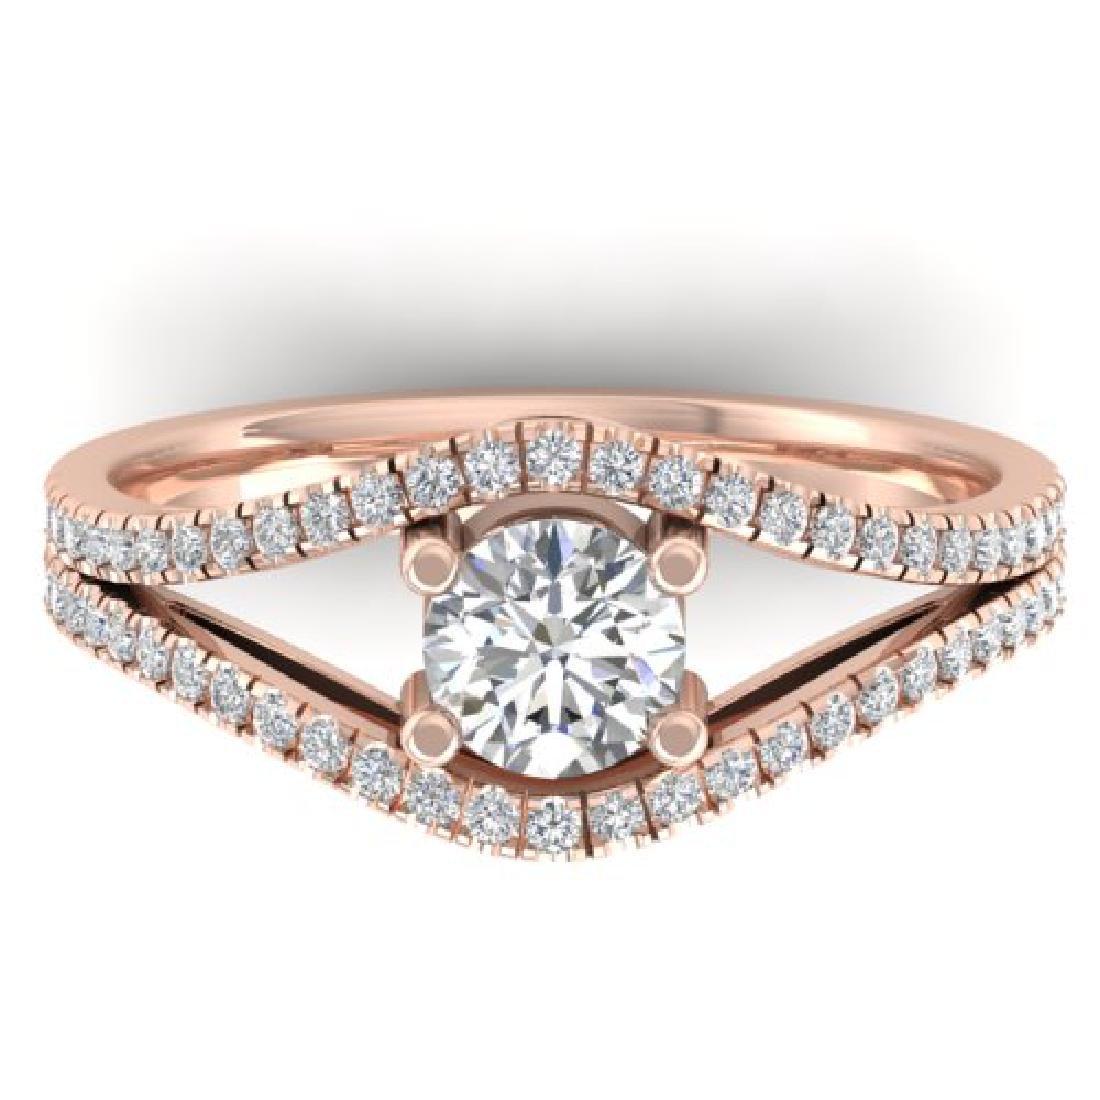 1.05 CTW Certified VS/SI Diamond Art Deco Ring 18K Rose